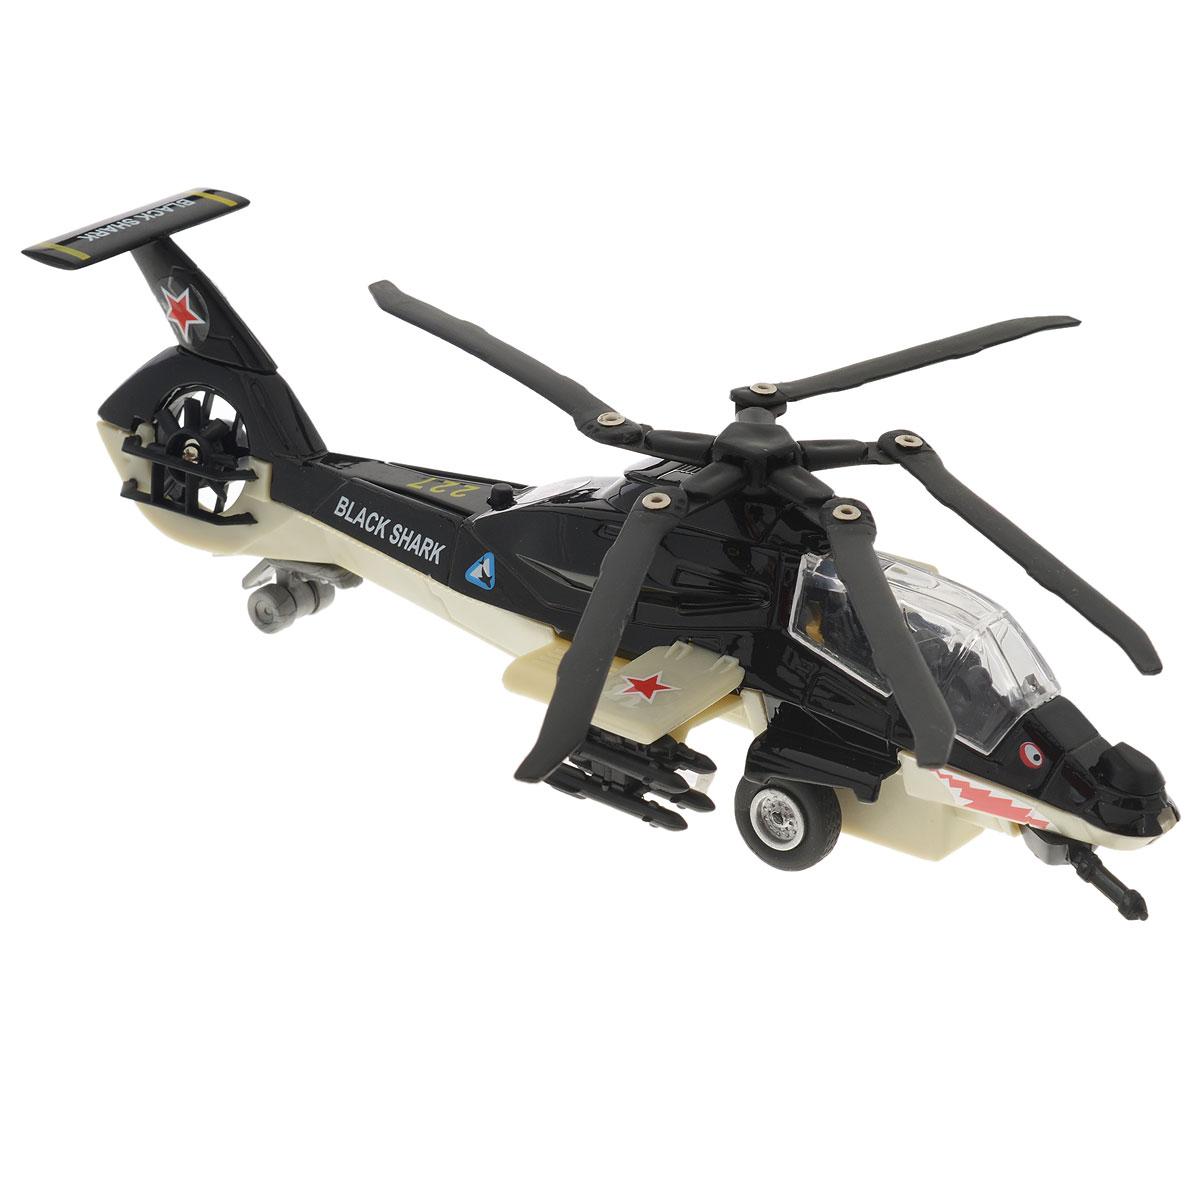 ТехноПарк Вертолет инерционный Black Shark